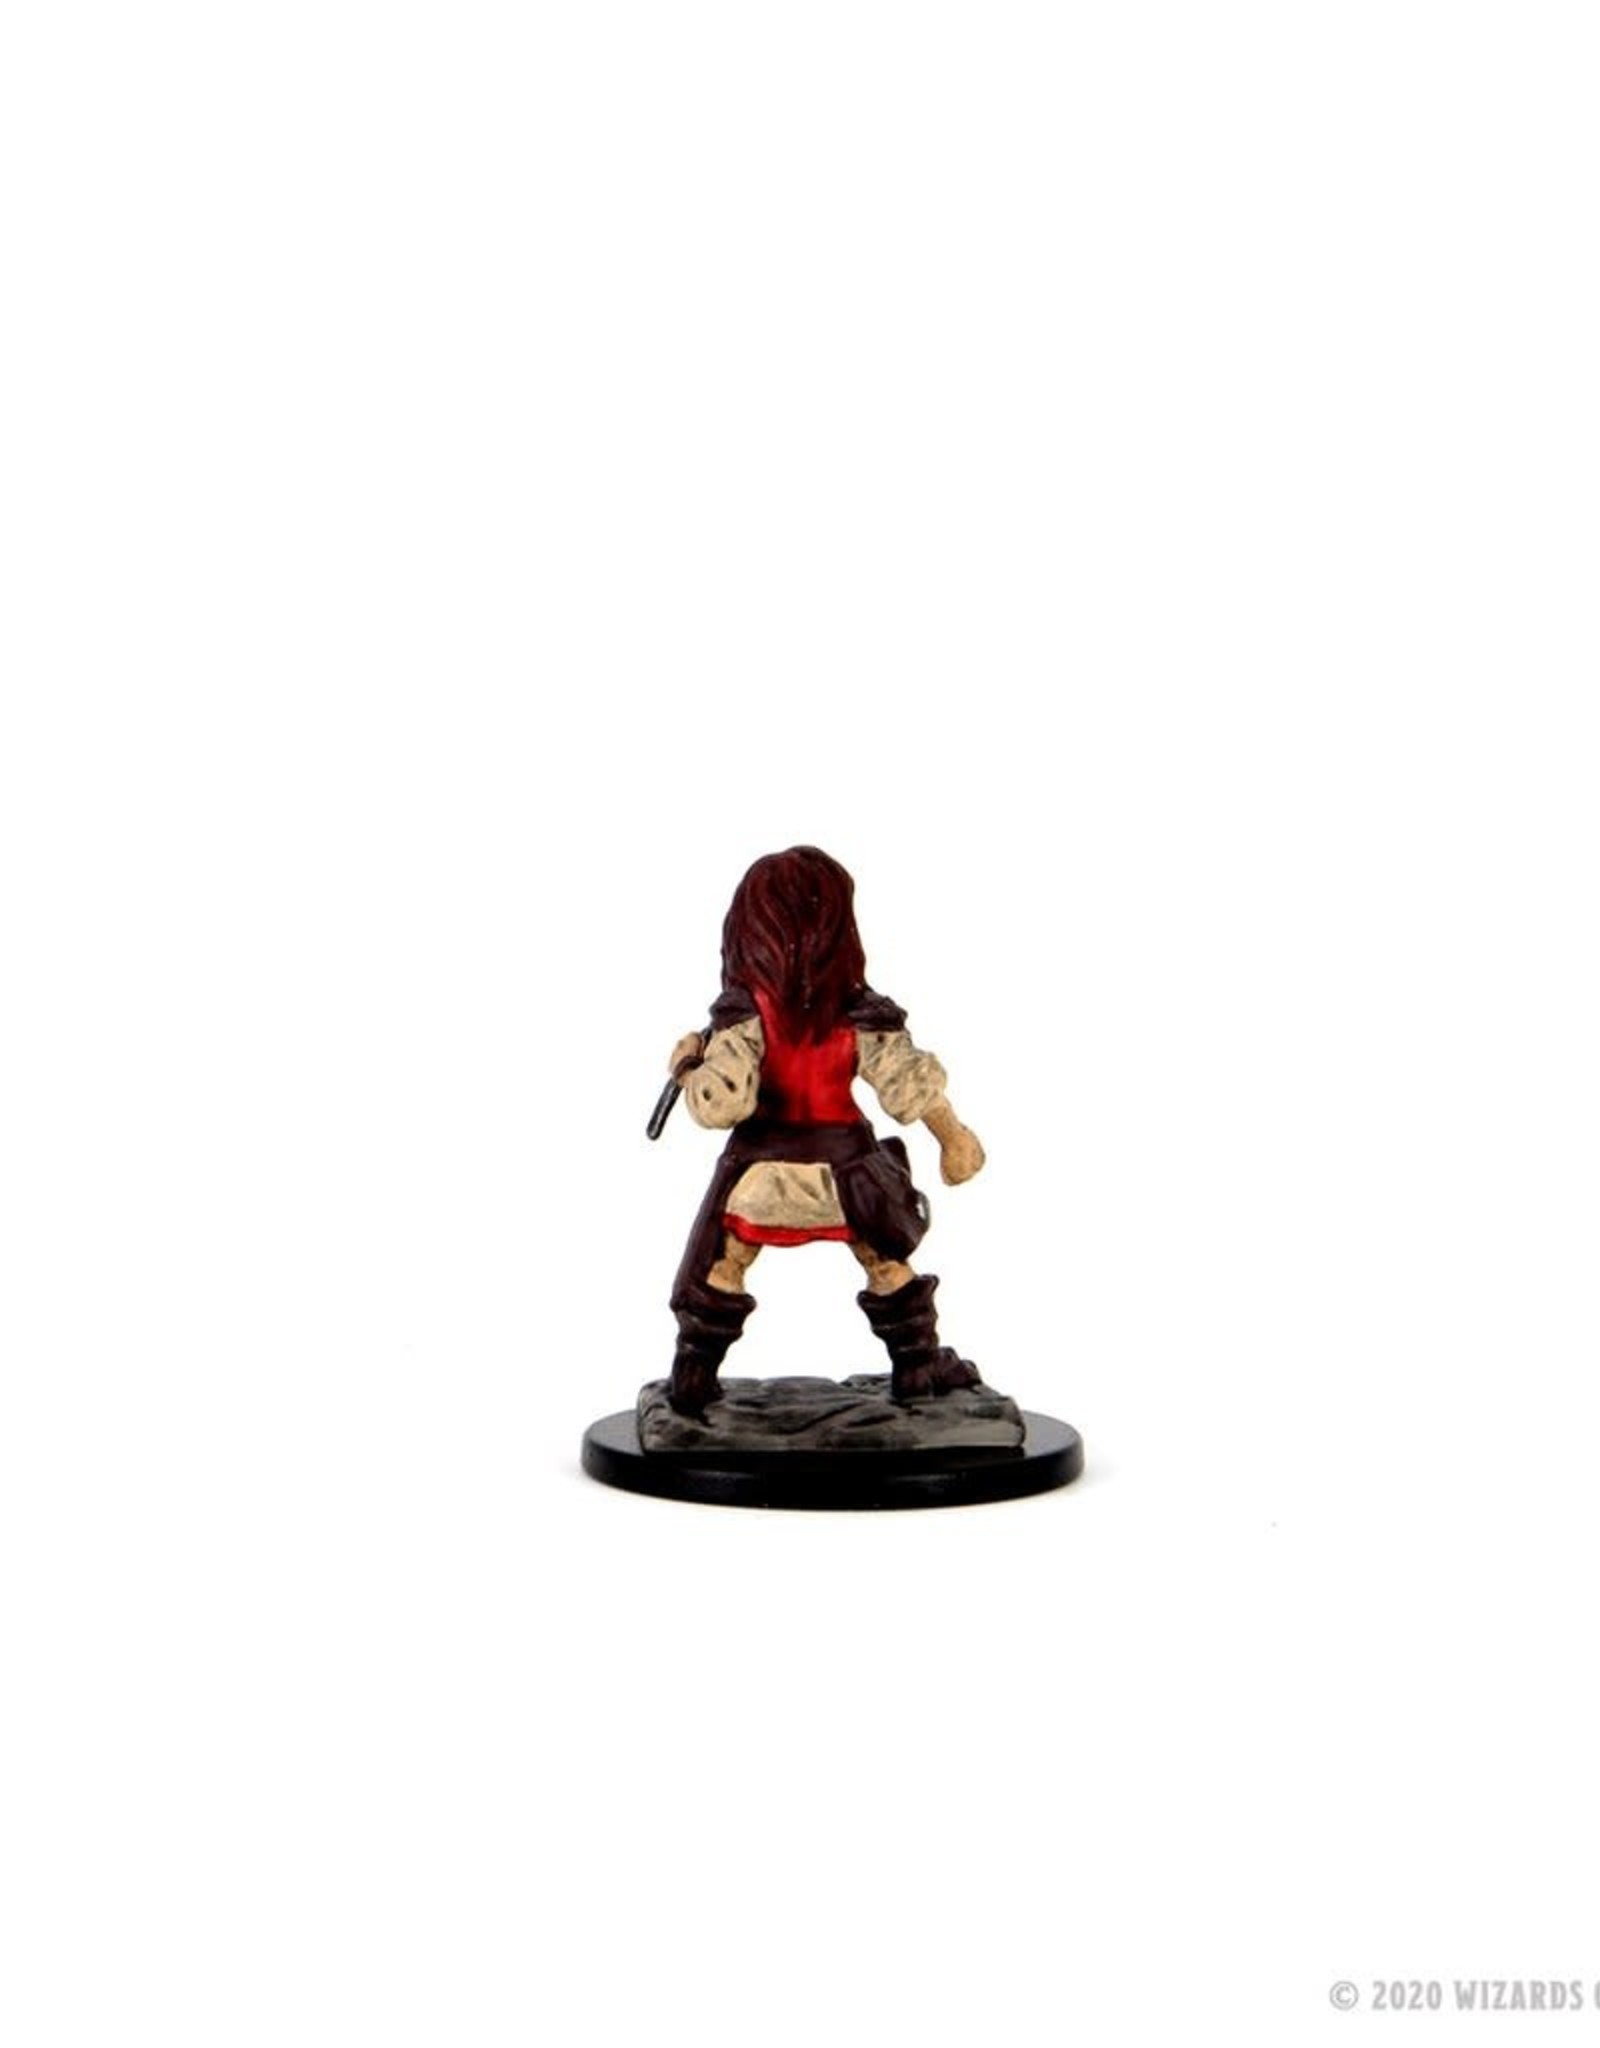 Wizkids D&D Premium Figure: Halfling Rogue Female